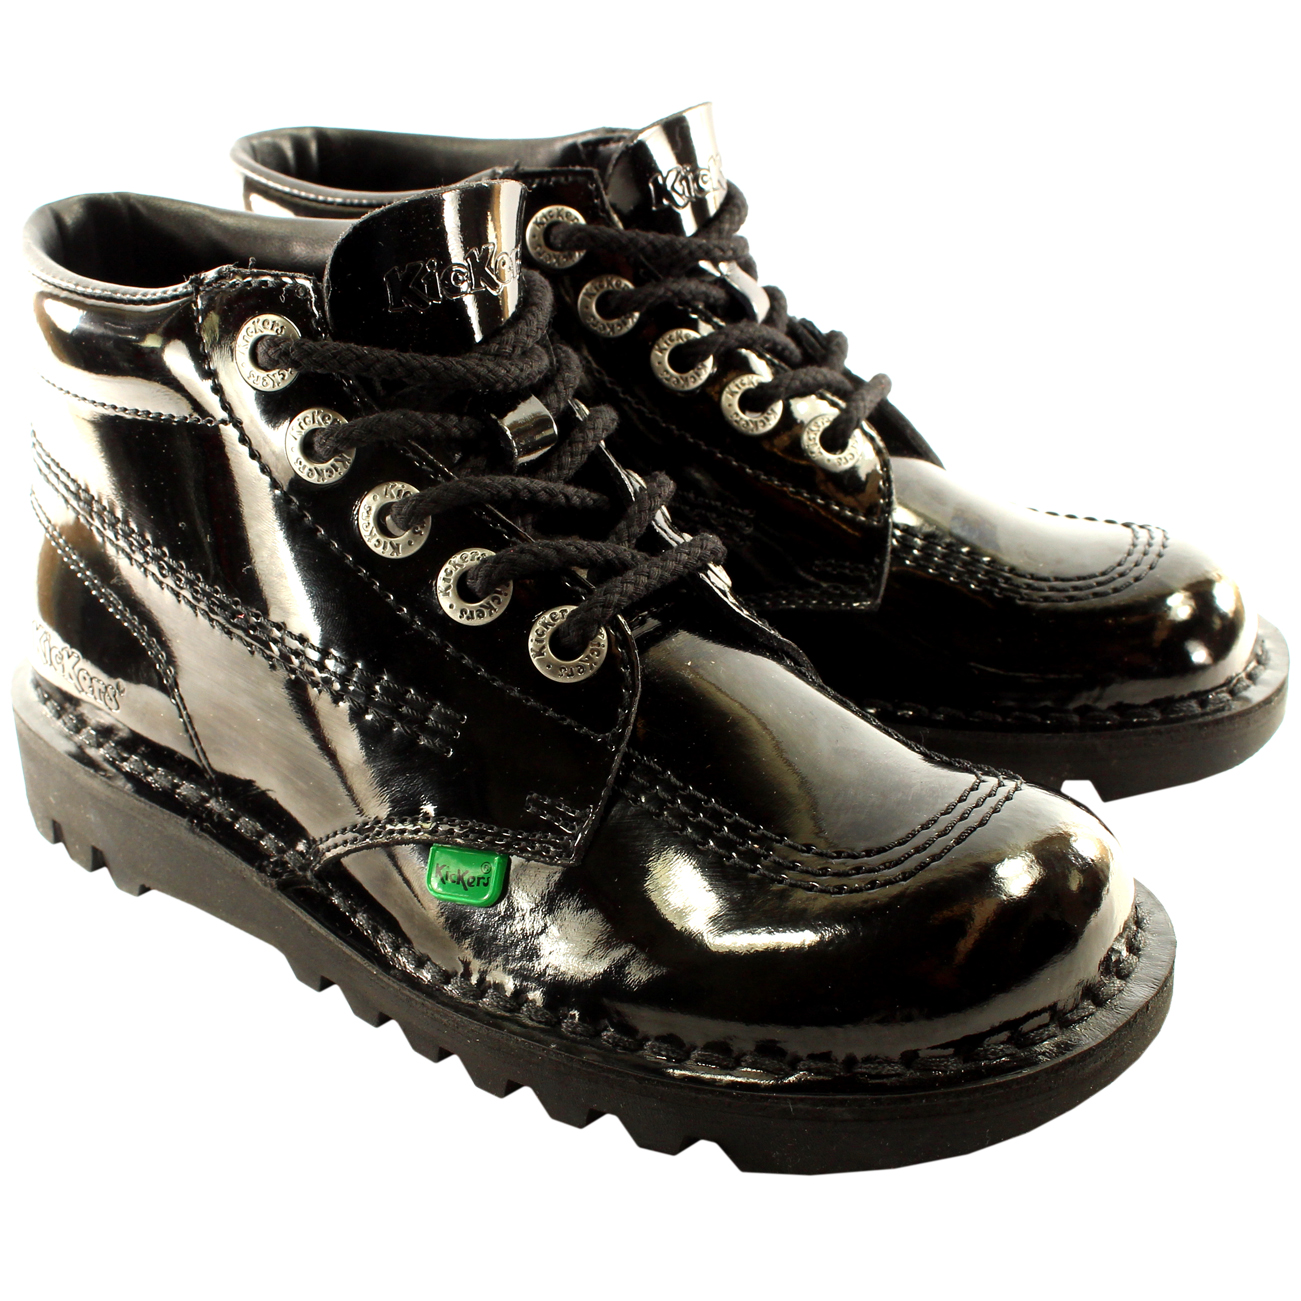 Kickers Kick Hi Patent Ankle Boots